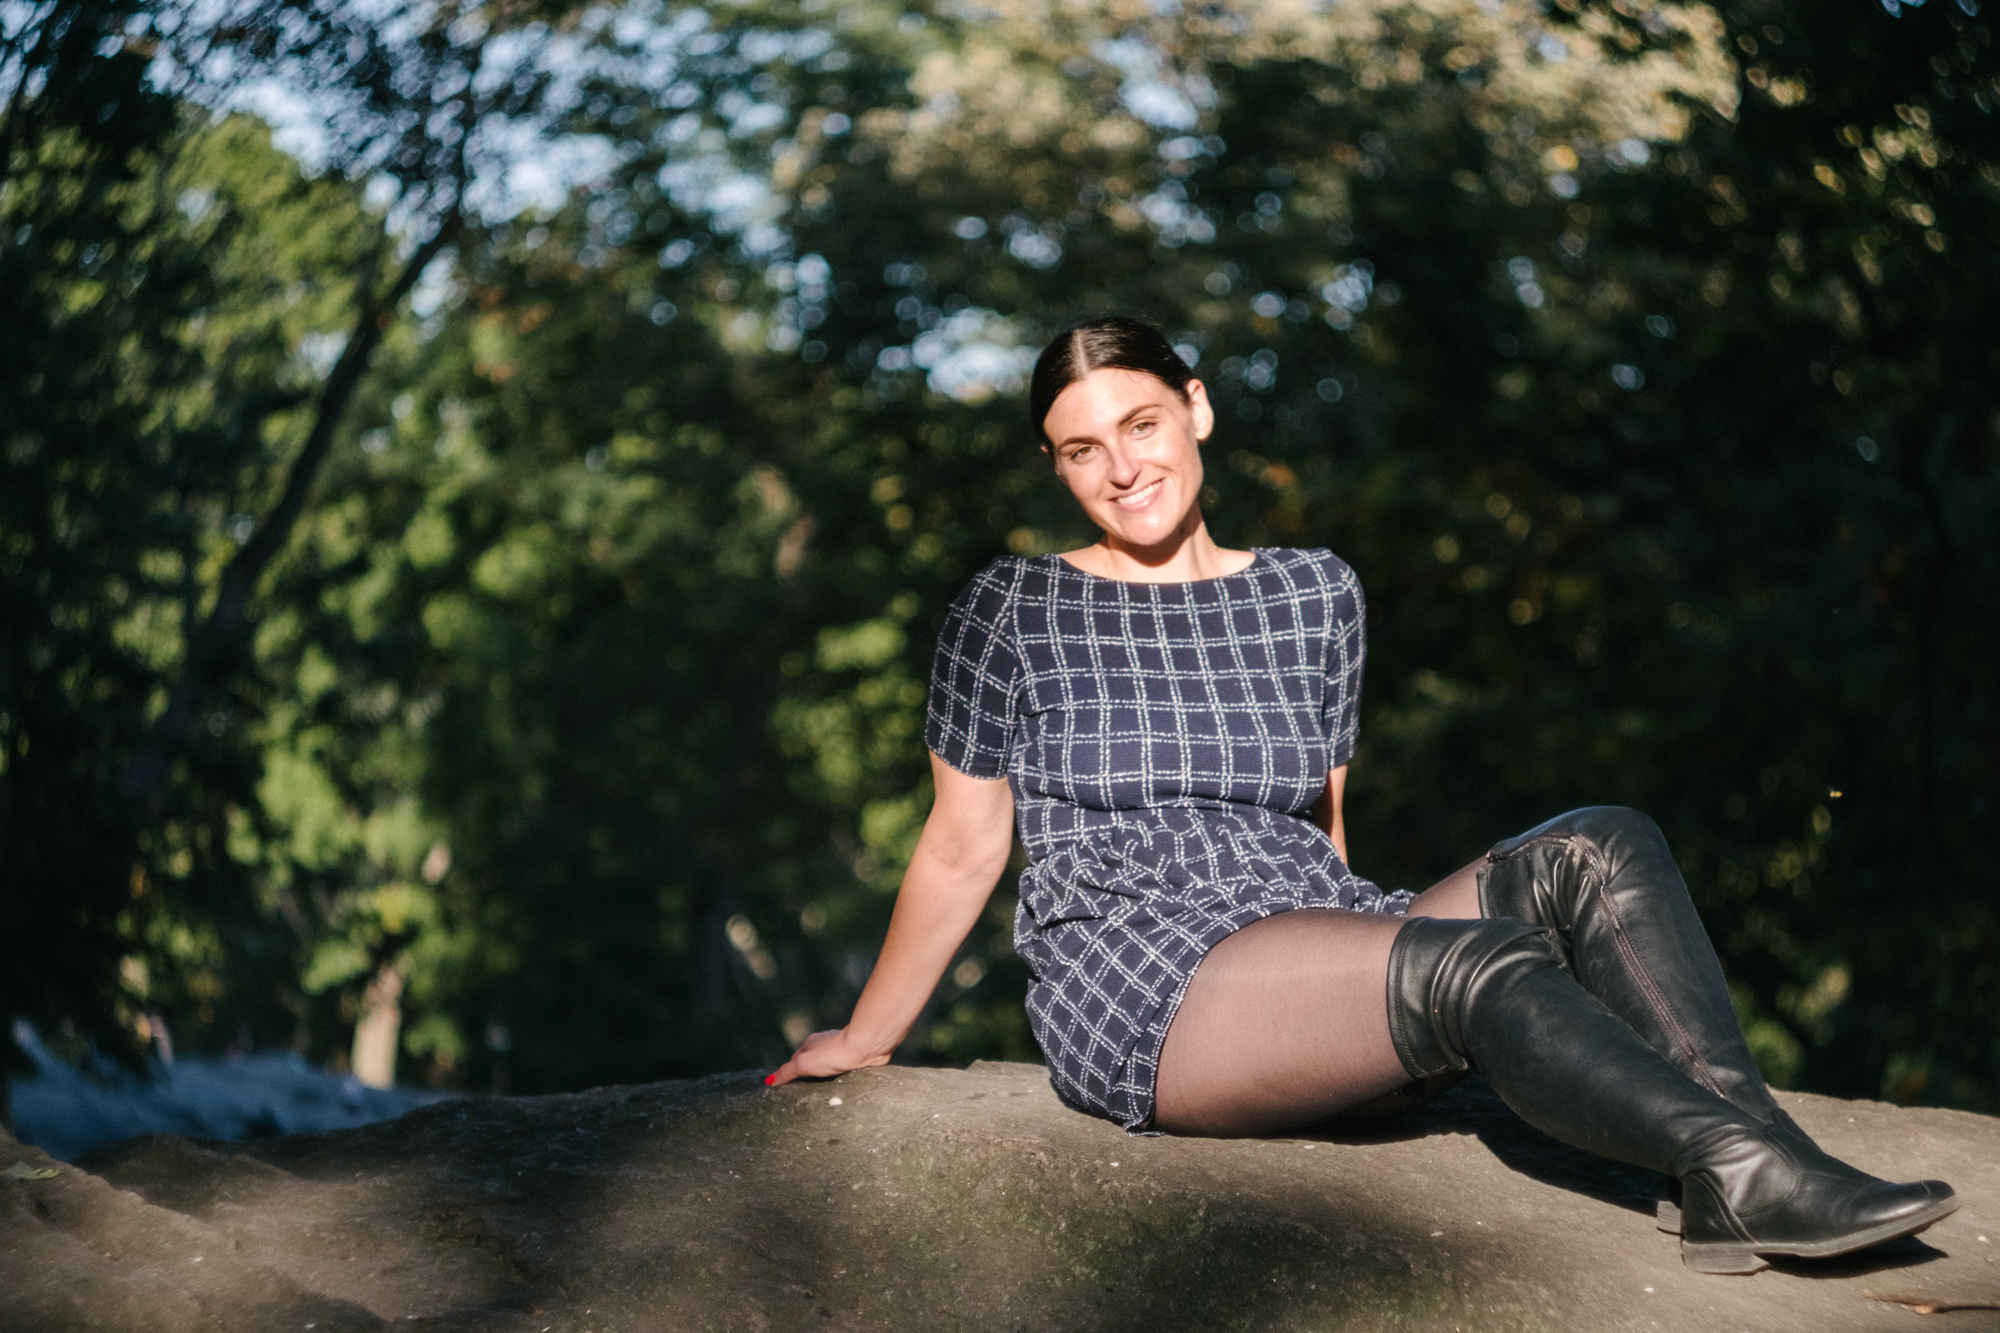 Allison in Central Park. Fuji X-Pro 2, Helios 44-4.